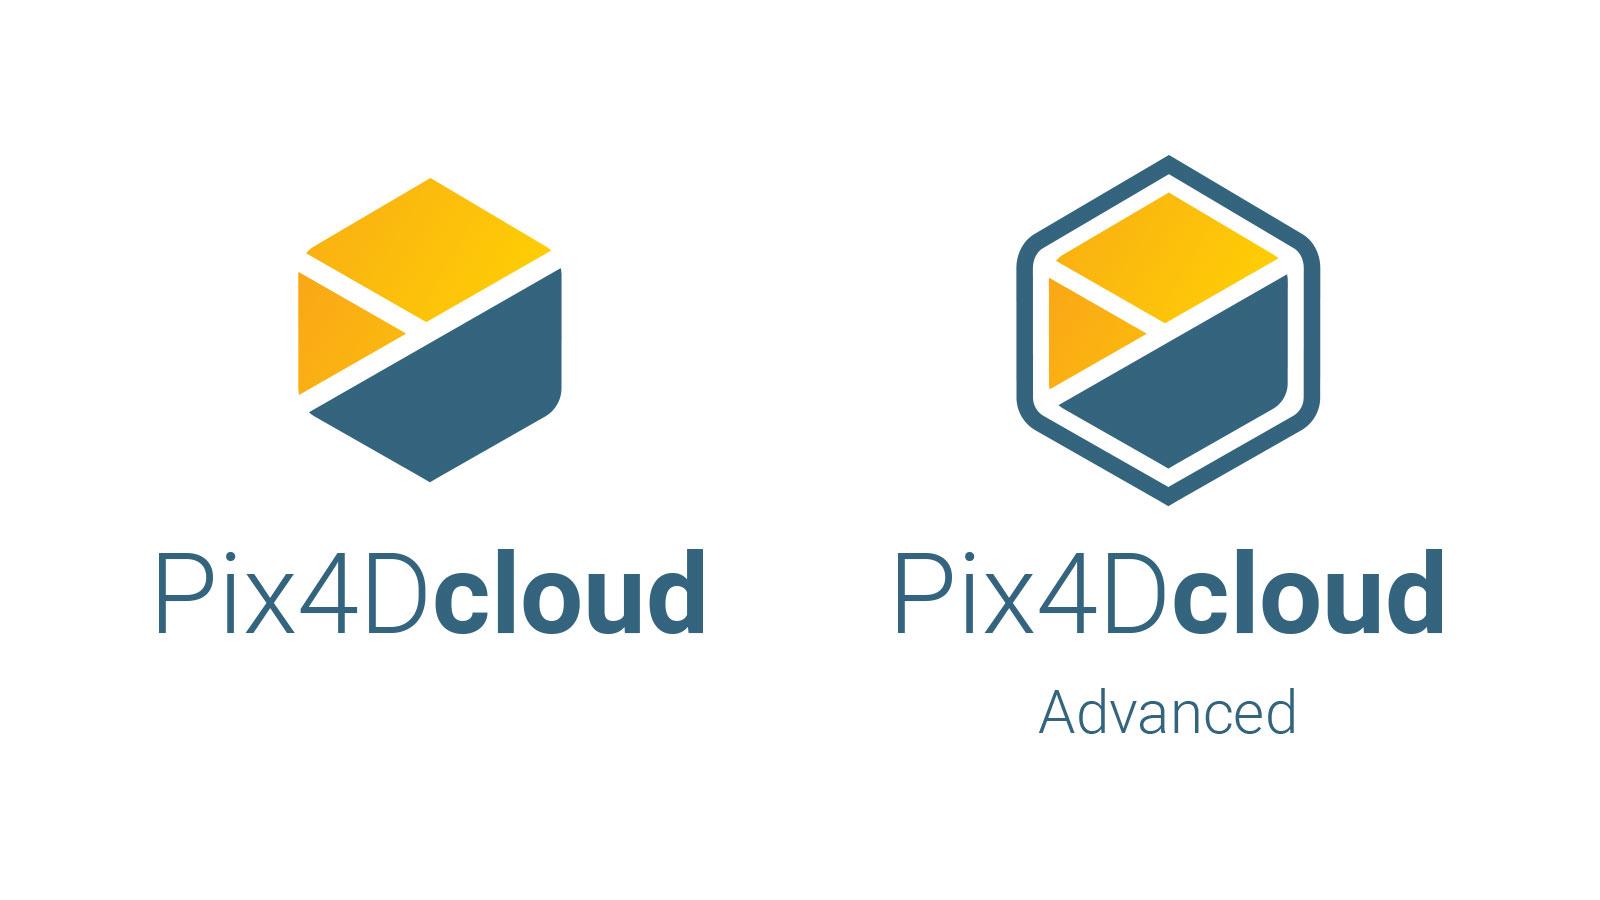 Pix4Dcloud and Pix4Dcloud Advanced